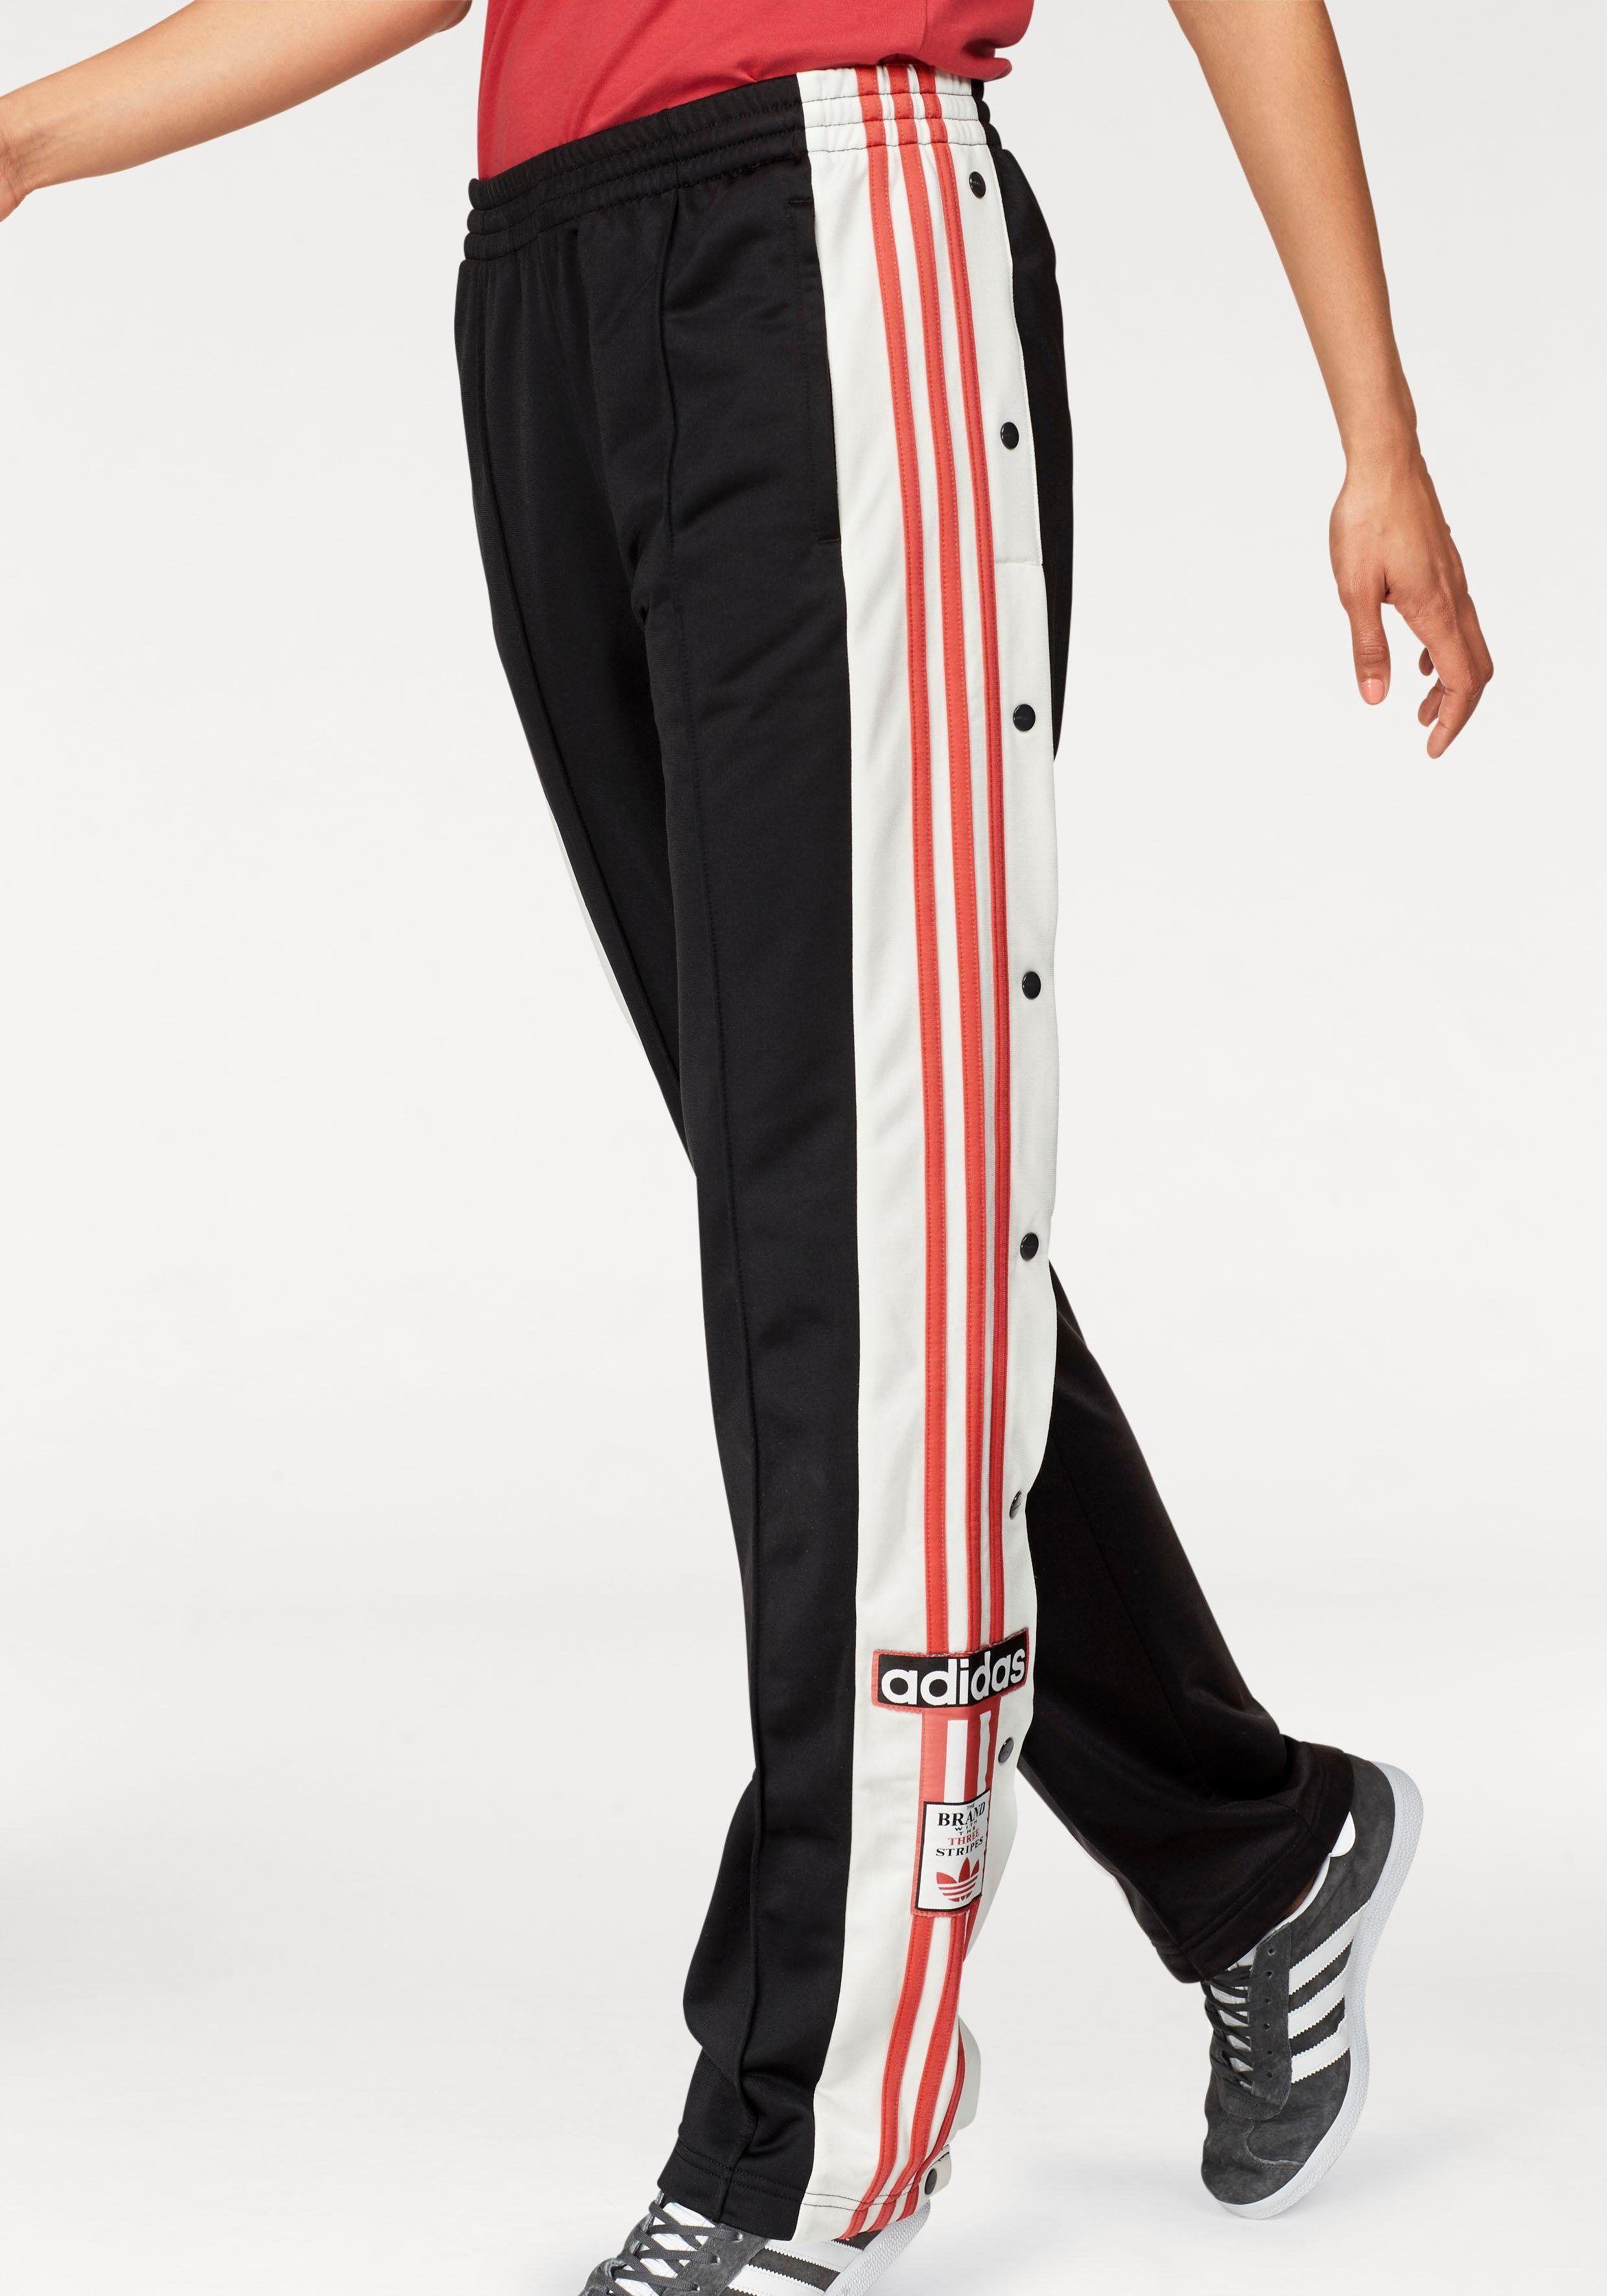 b1eb408d94ccb8  OTTO  ADIDAS  Bekleidung  Hosen  Sportbekleidung  Trainingshosen  Damen   adidas